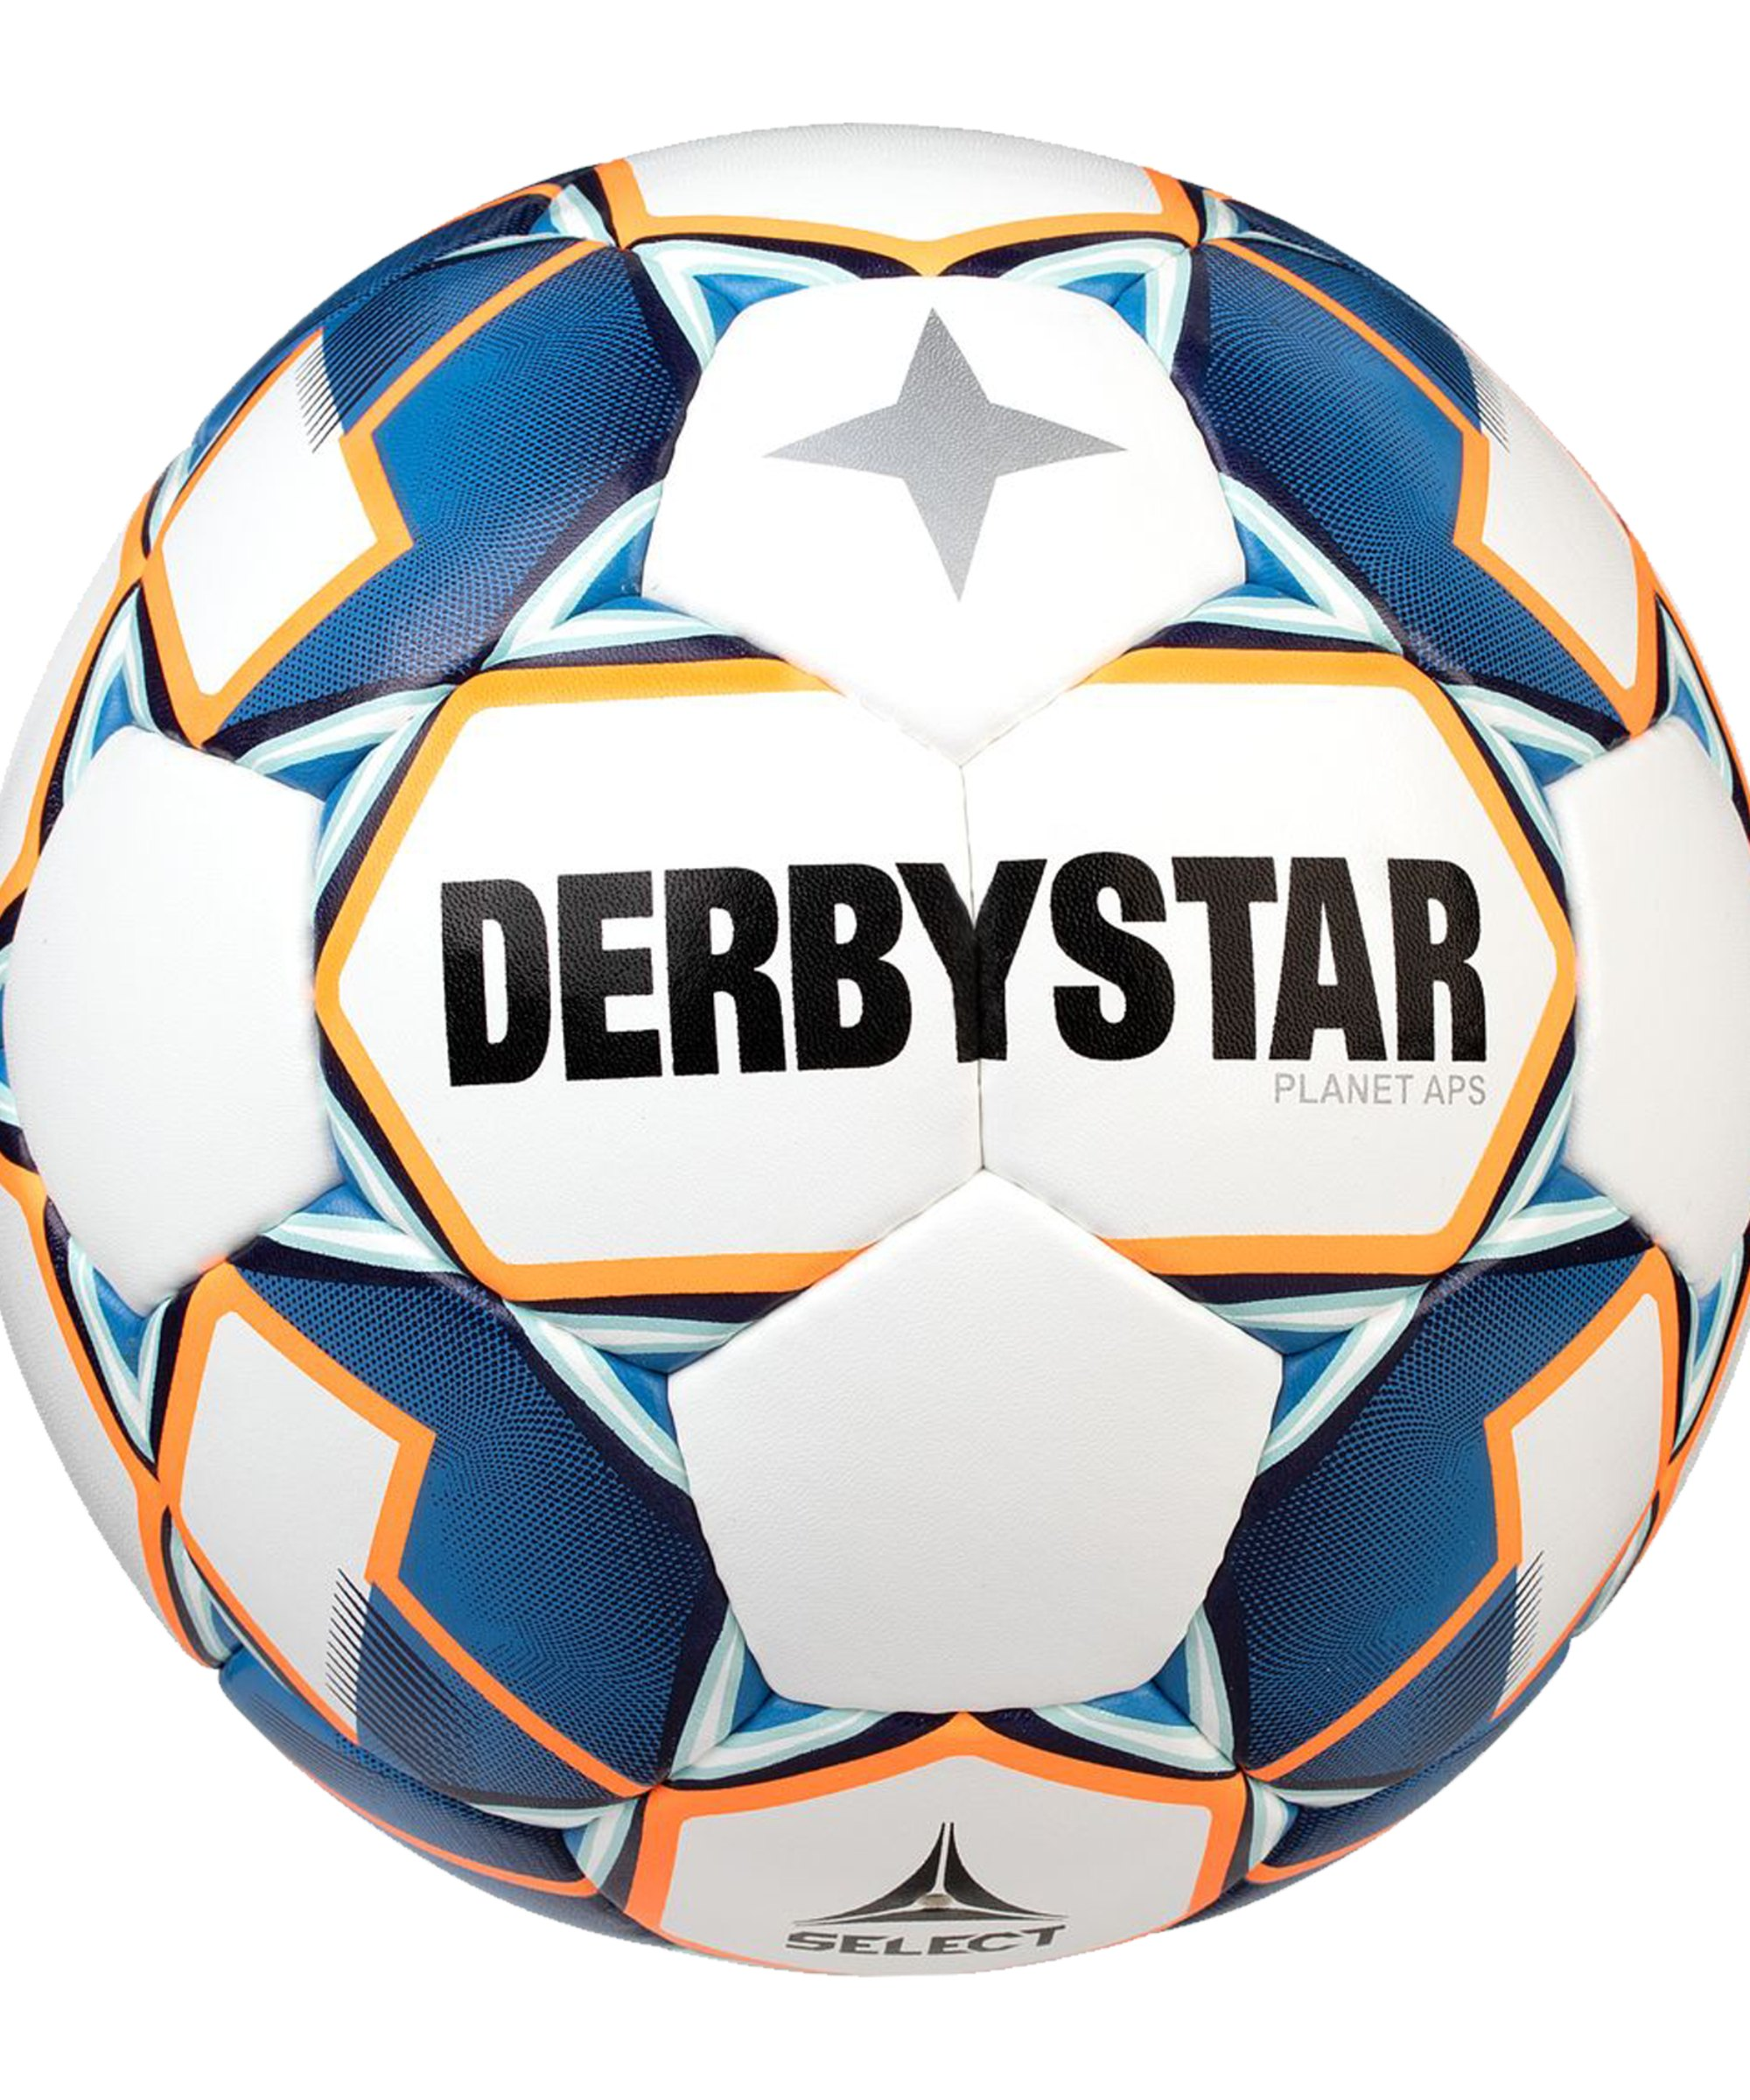 Derbystar FB-Planet APS V20 Spielball Weiss F167 - weiss